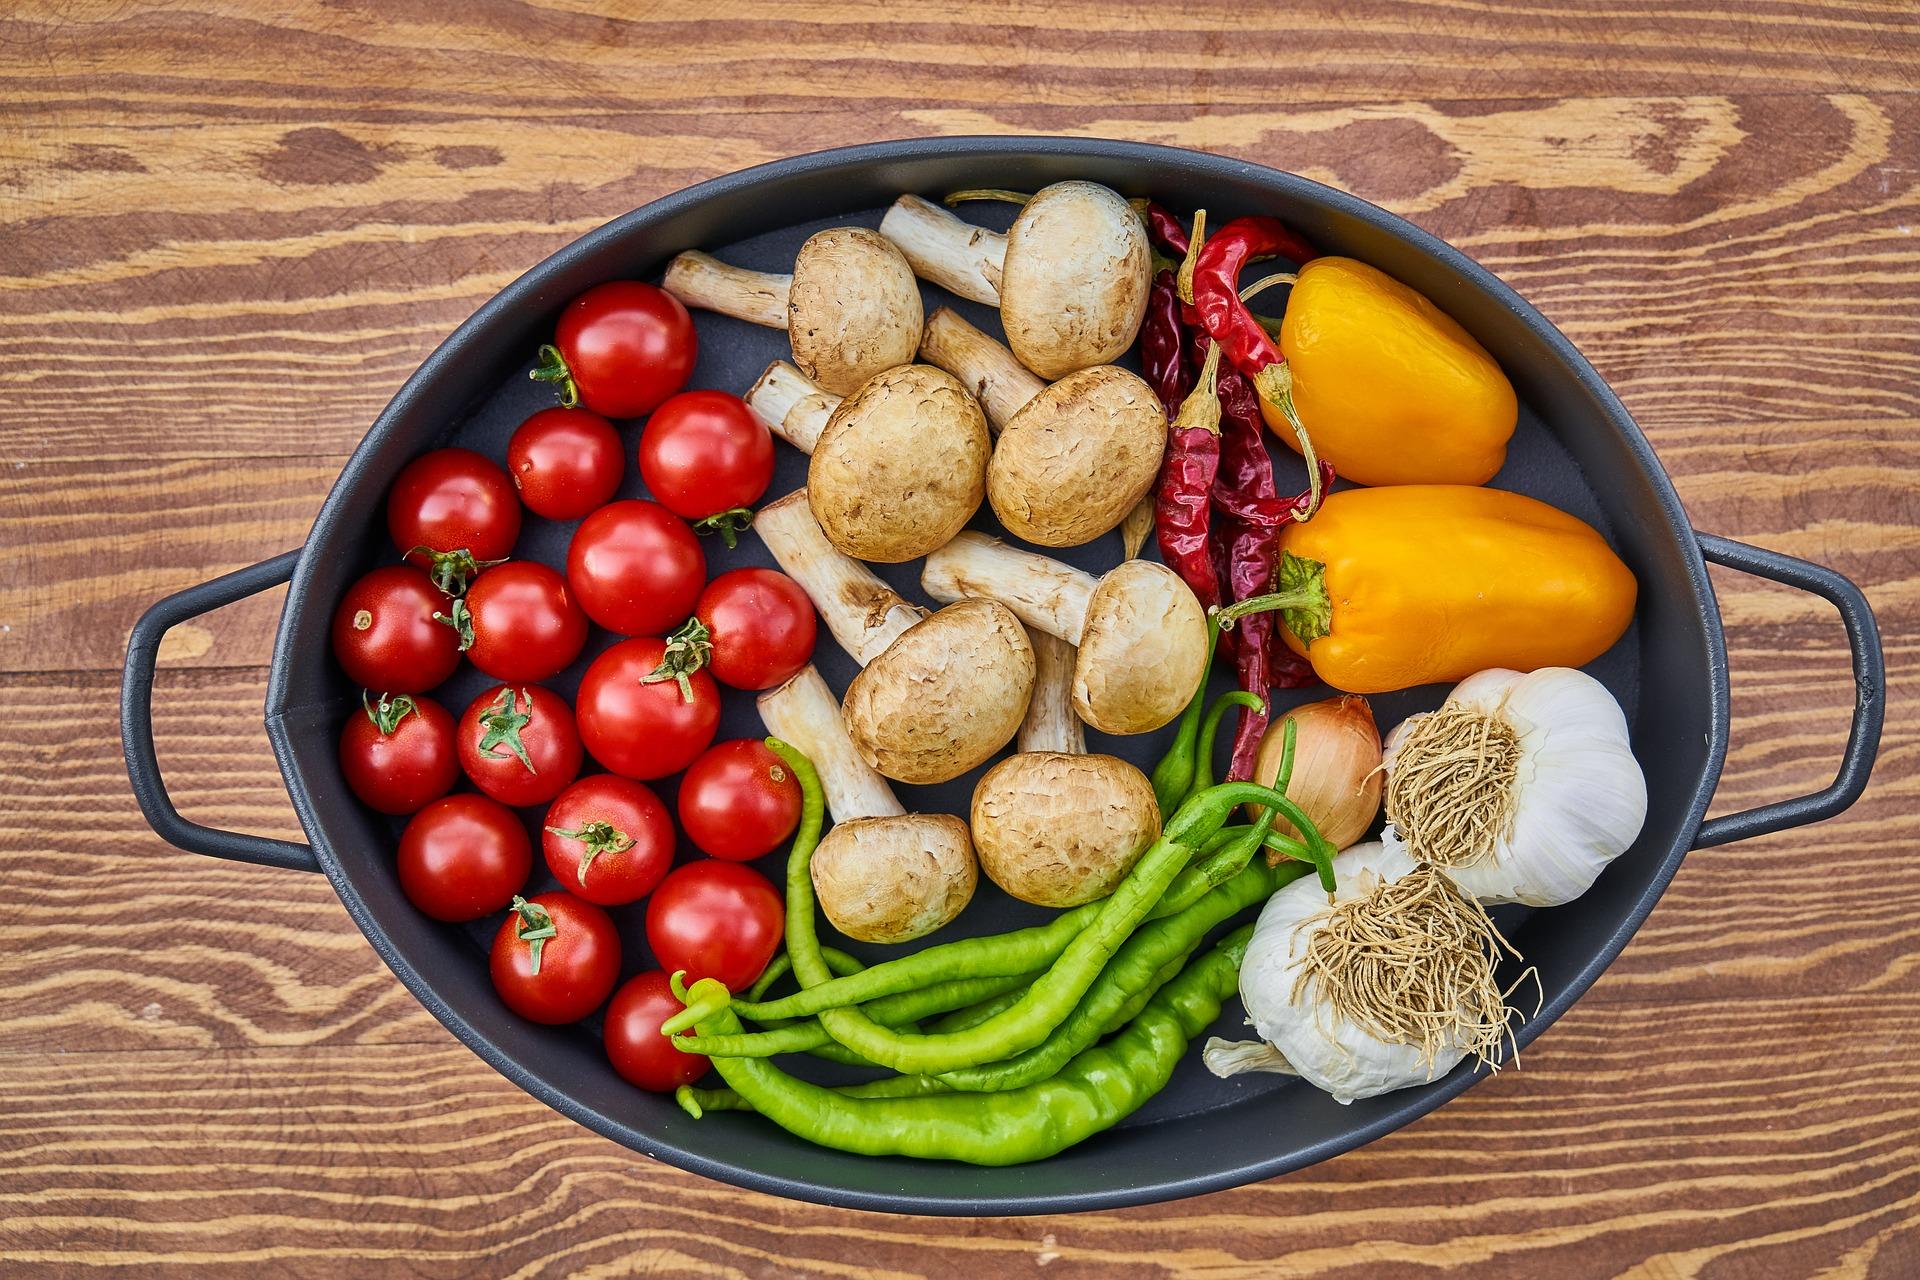 Pourquoi faut-il privilégier la nourriture bio?